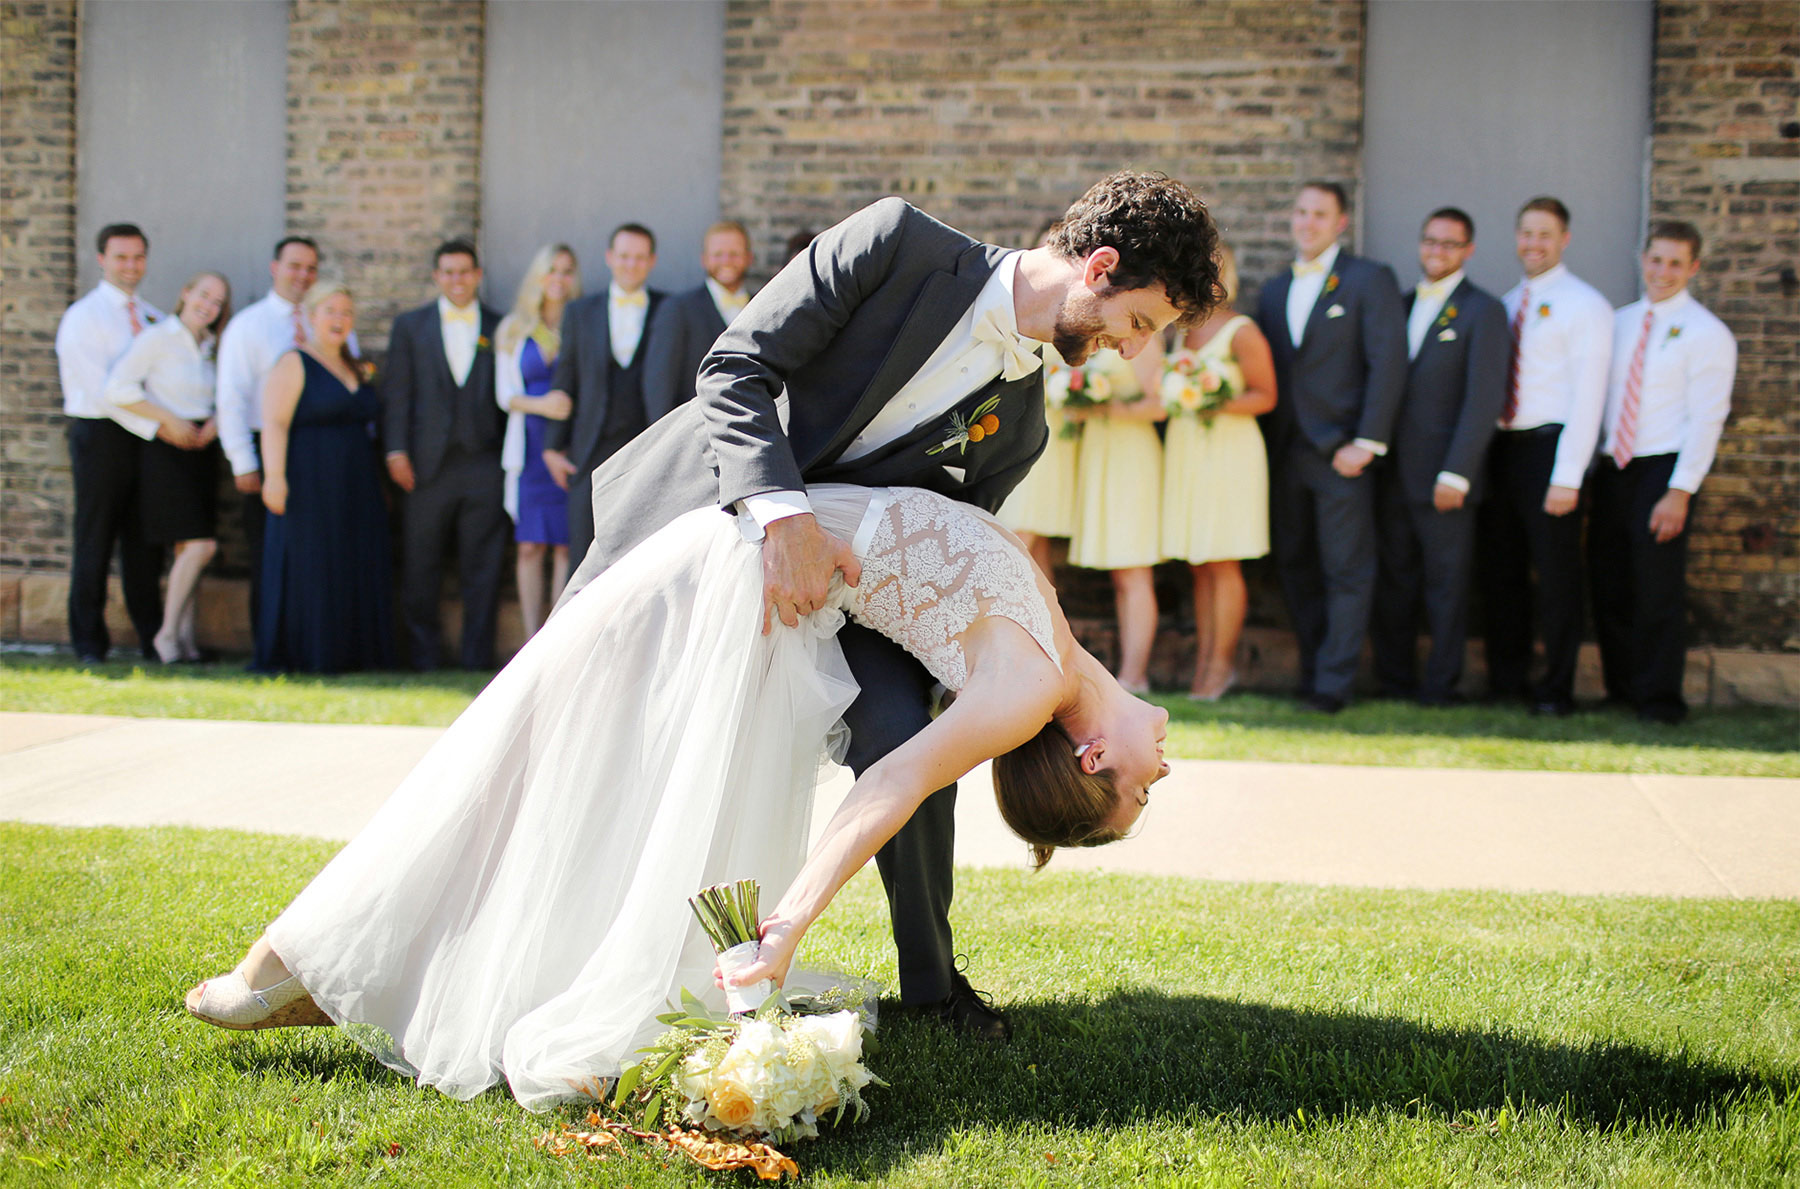 16-Minneapolis-Minnesota-Wedding-Photography-by-Vick-Photography-Downtown-Wedding-Party-Group-Sarah-&-Tom.jpg